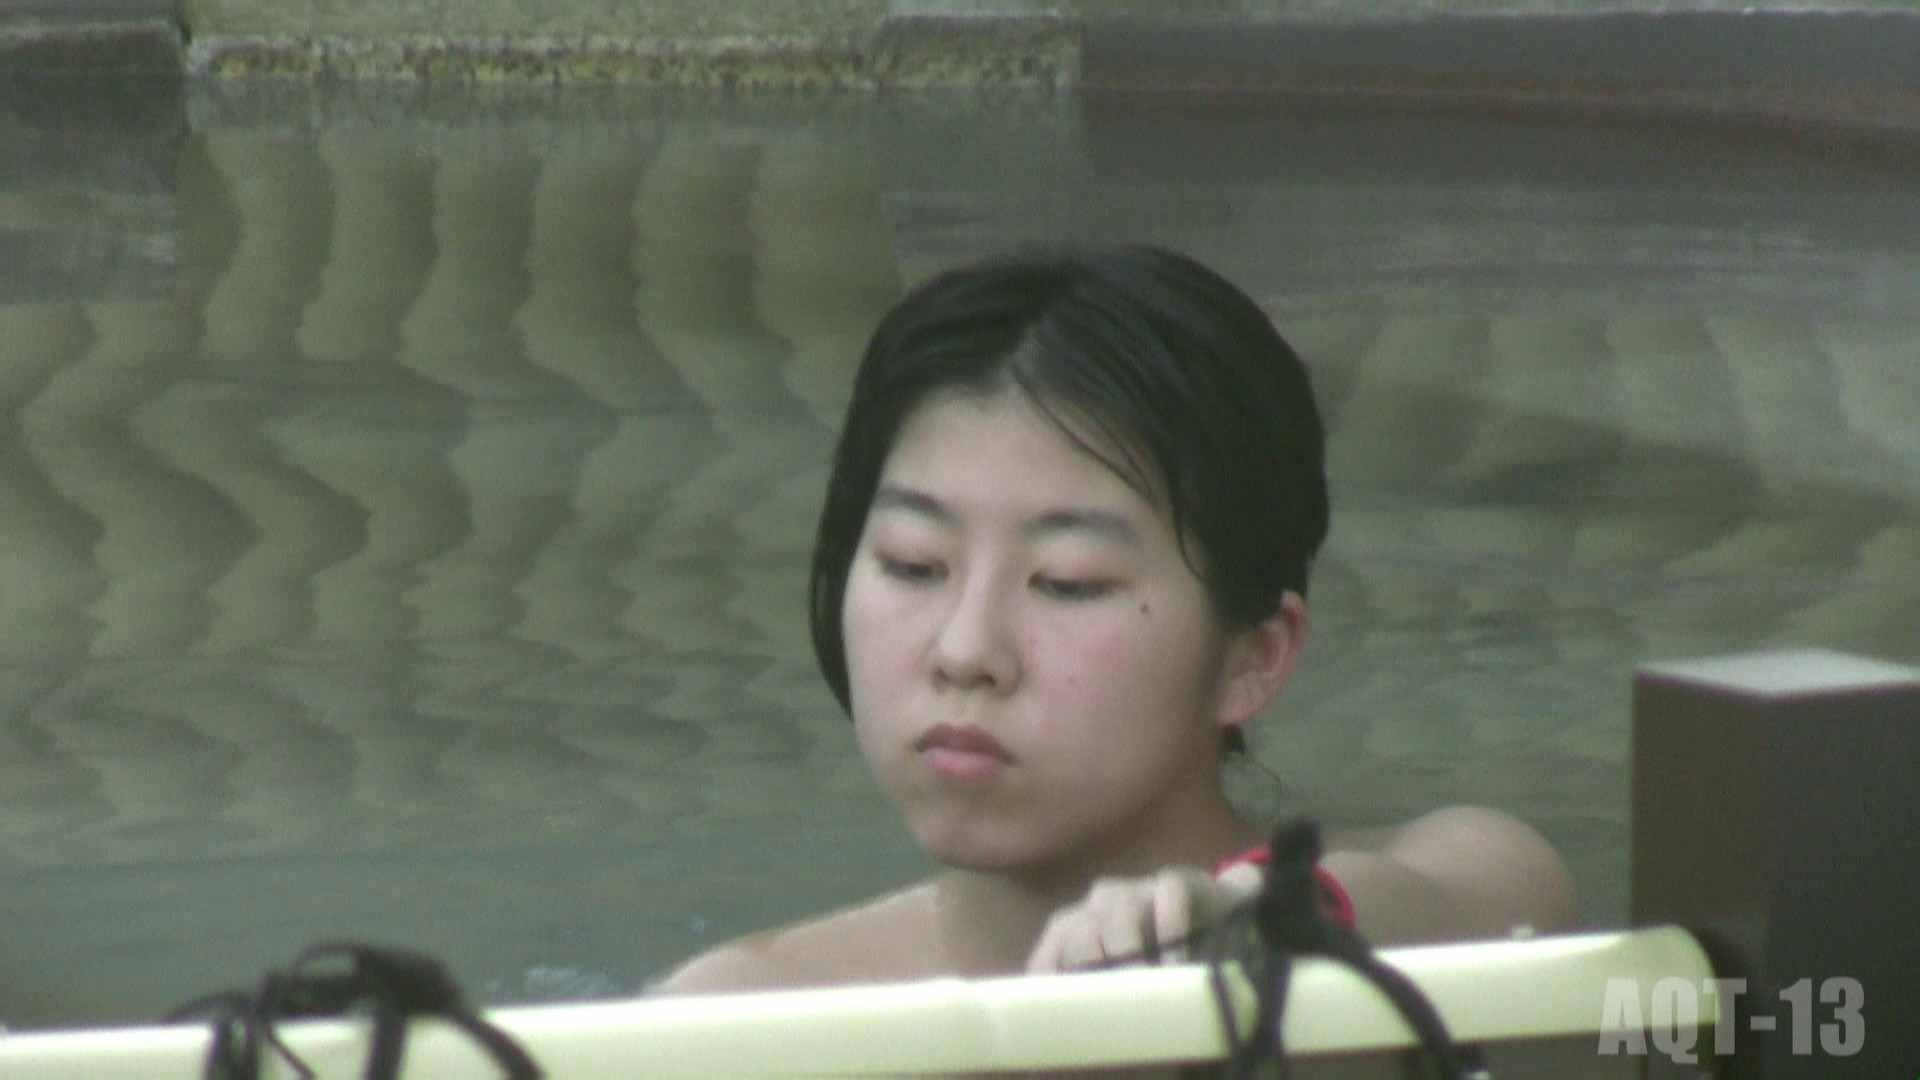 Aquaな露天風呂Vol.816 OLのエロ生活 | 露天風呂  90連発 61